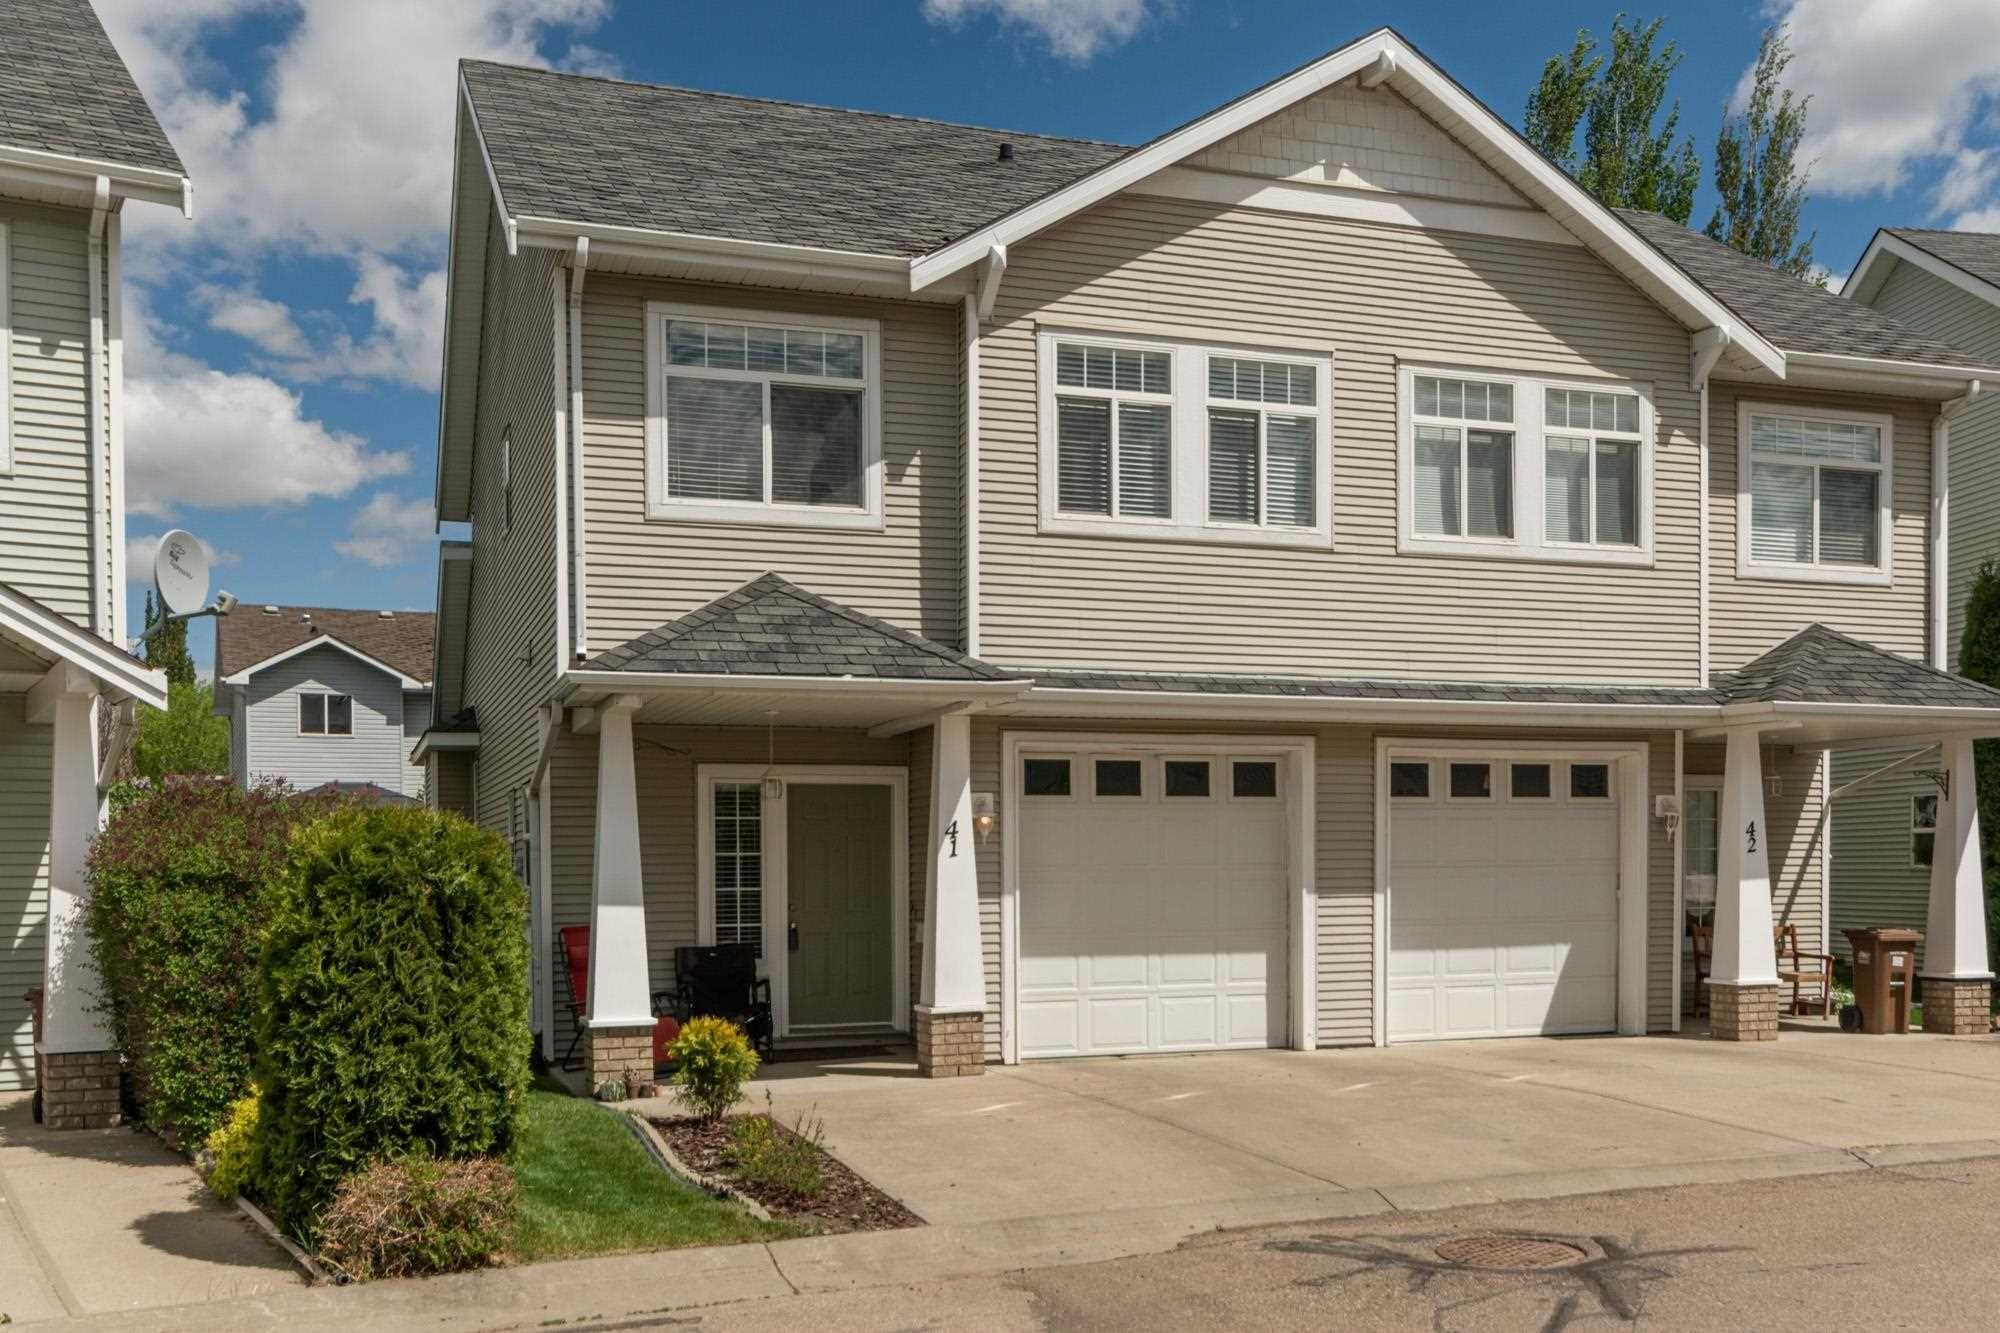 Main Photo: 41 200 ERIN RIDGE Drive: St. Albert House Half Duplex for sale : MLS®# E4246397